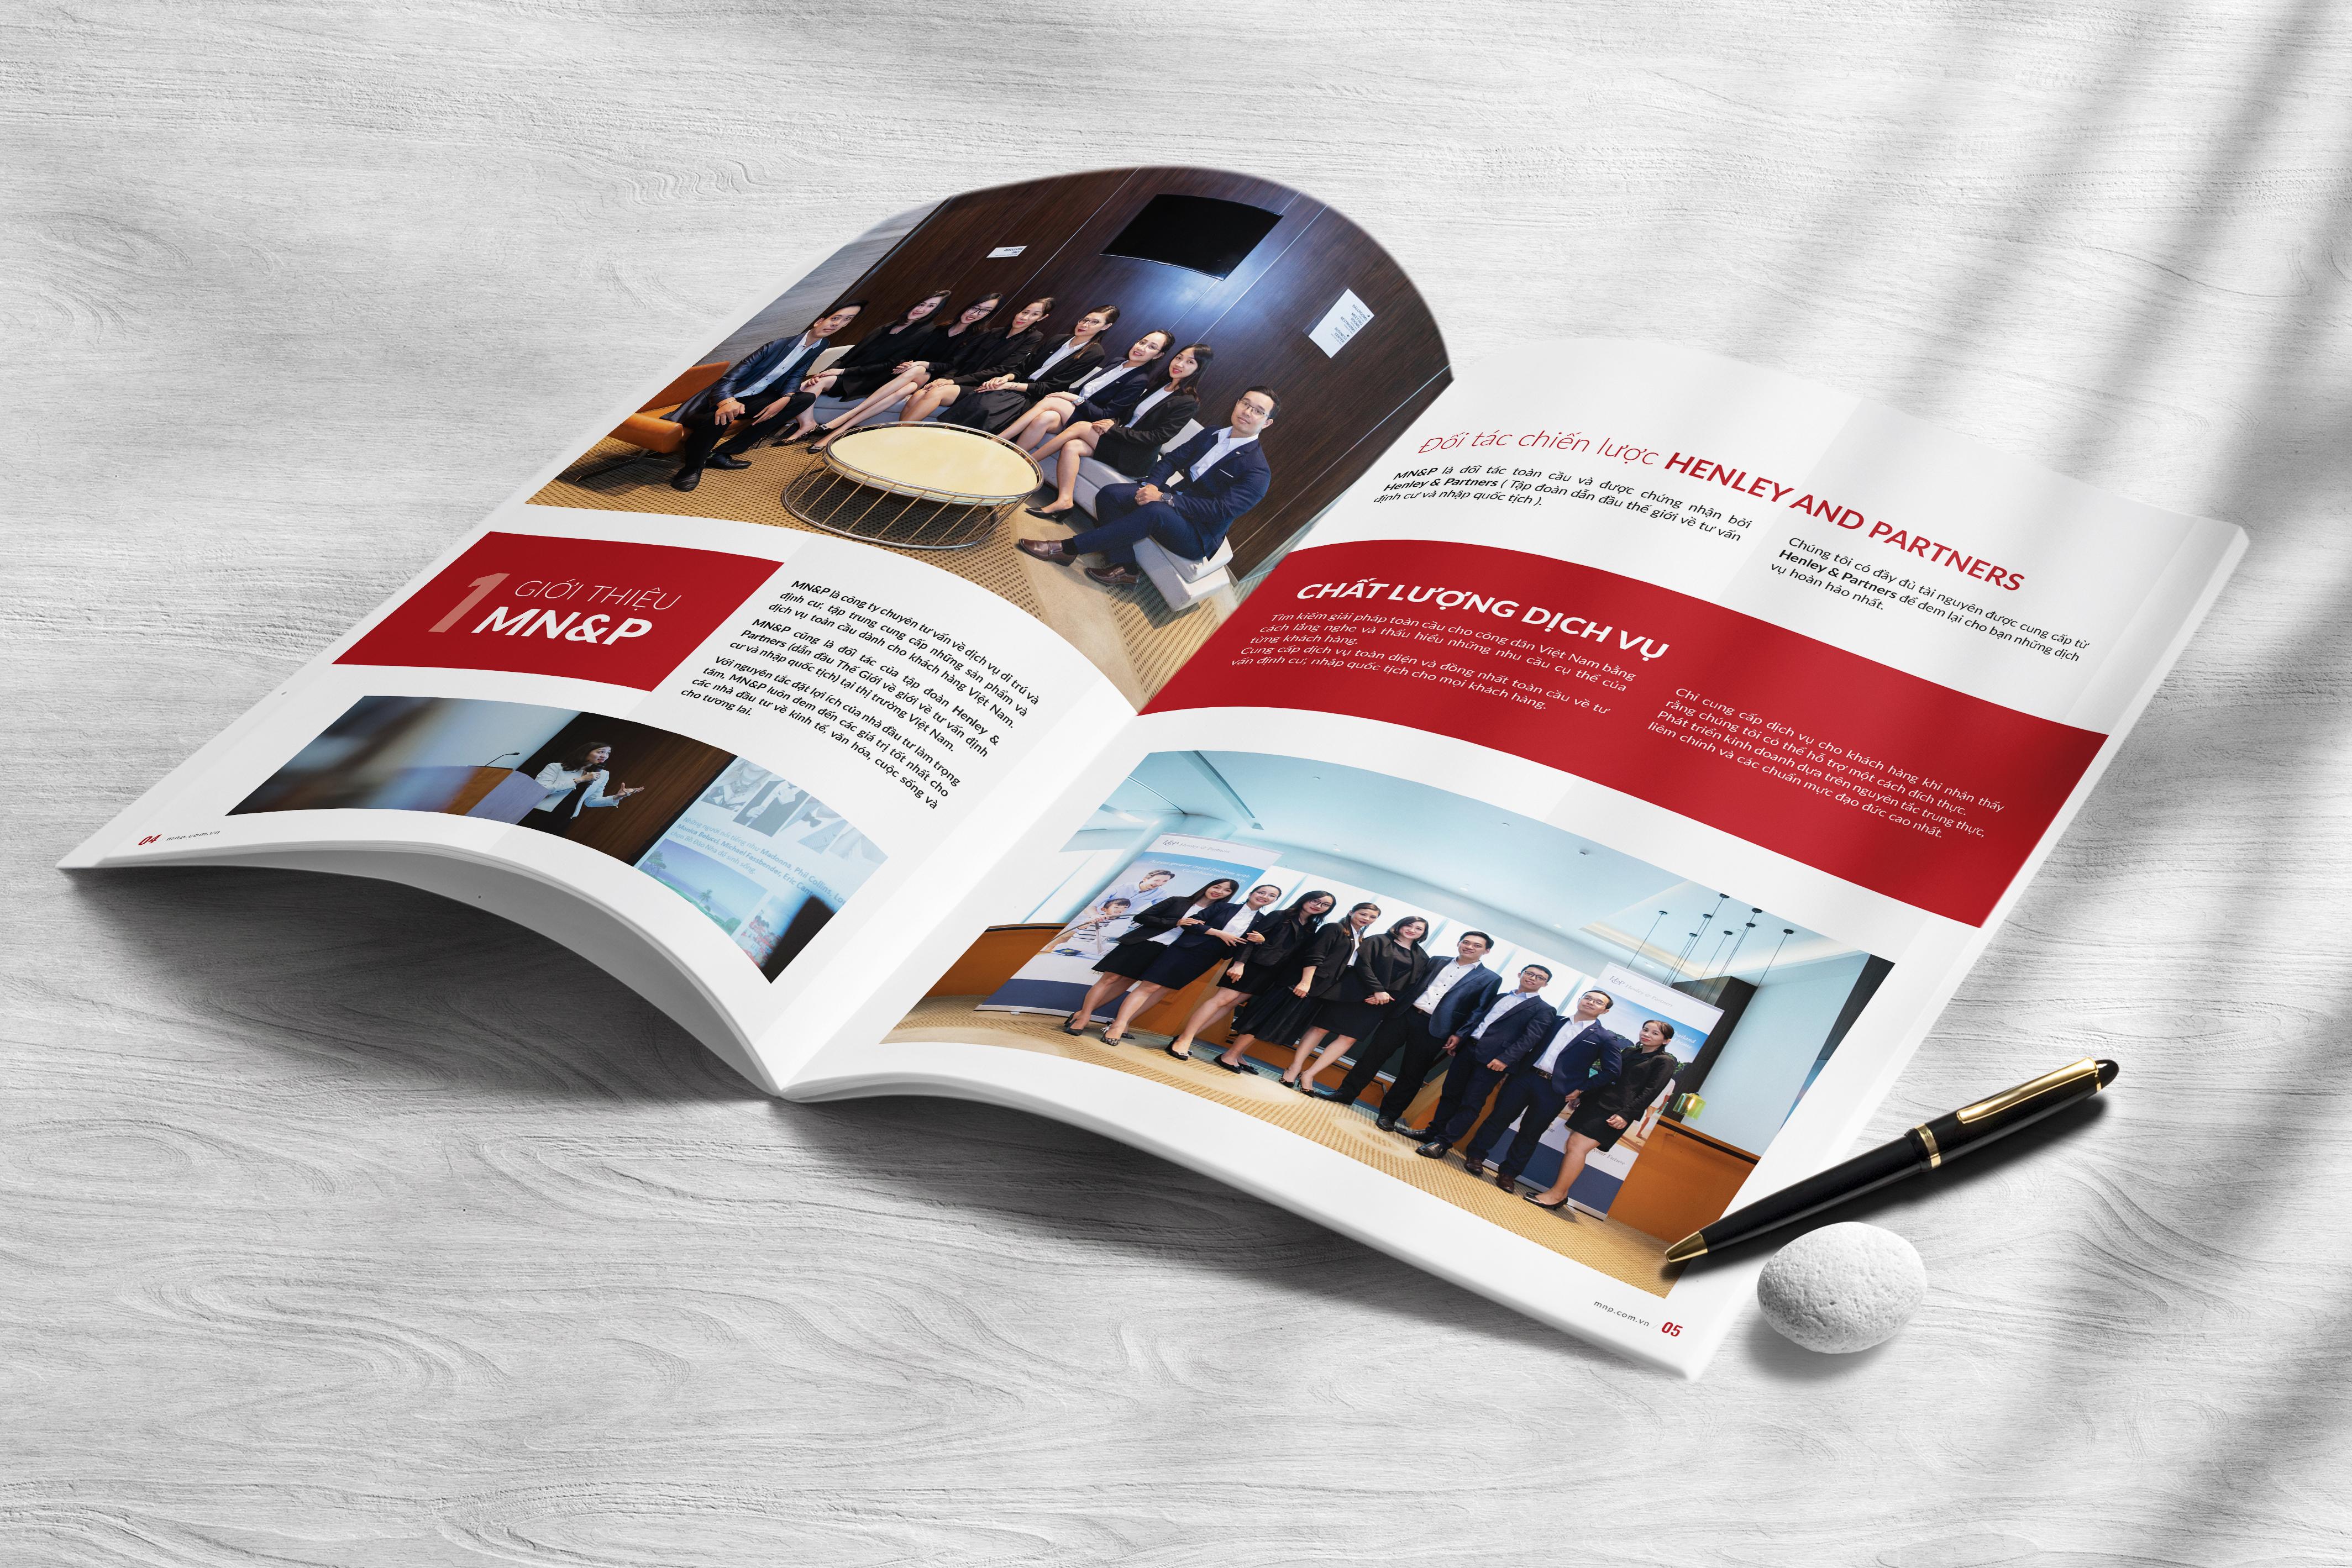 thiet_ke_in_brochure_magazine_re_dep_MNP_04